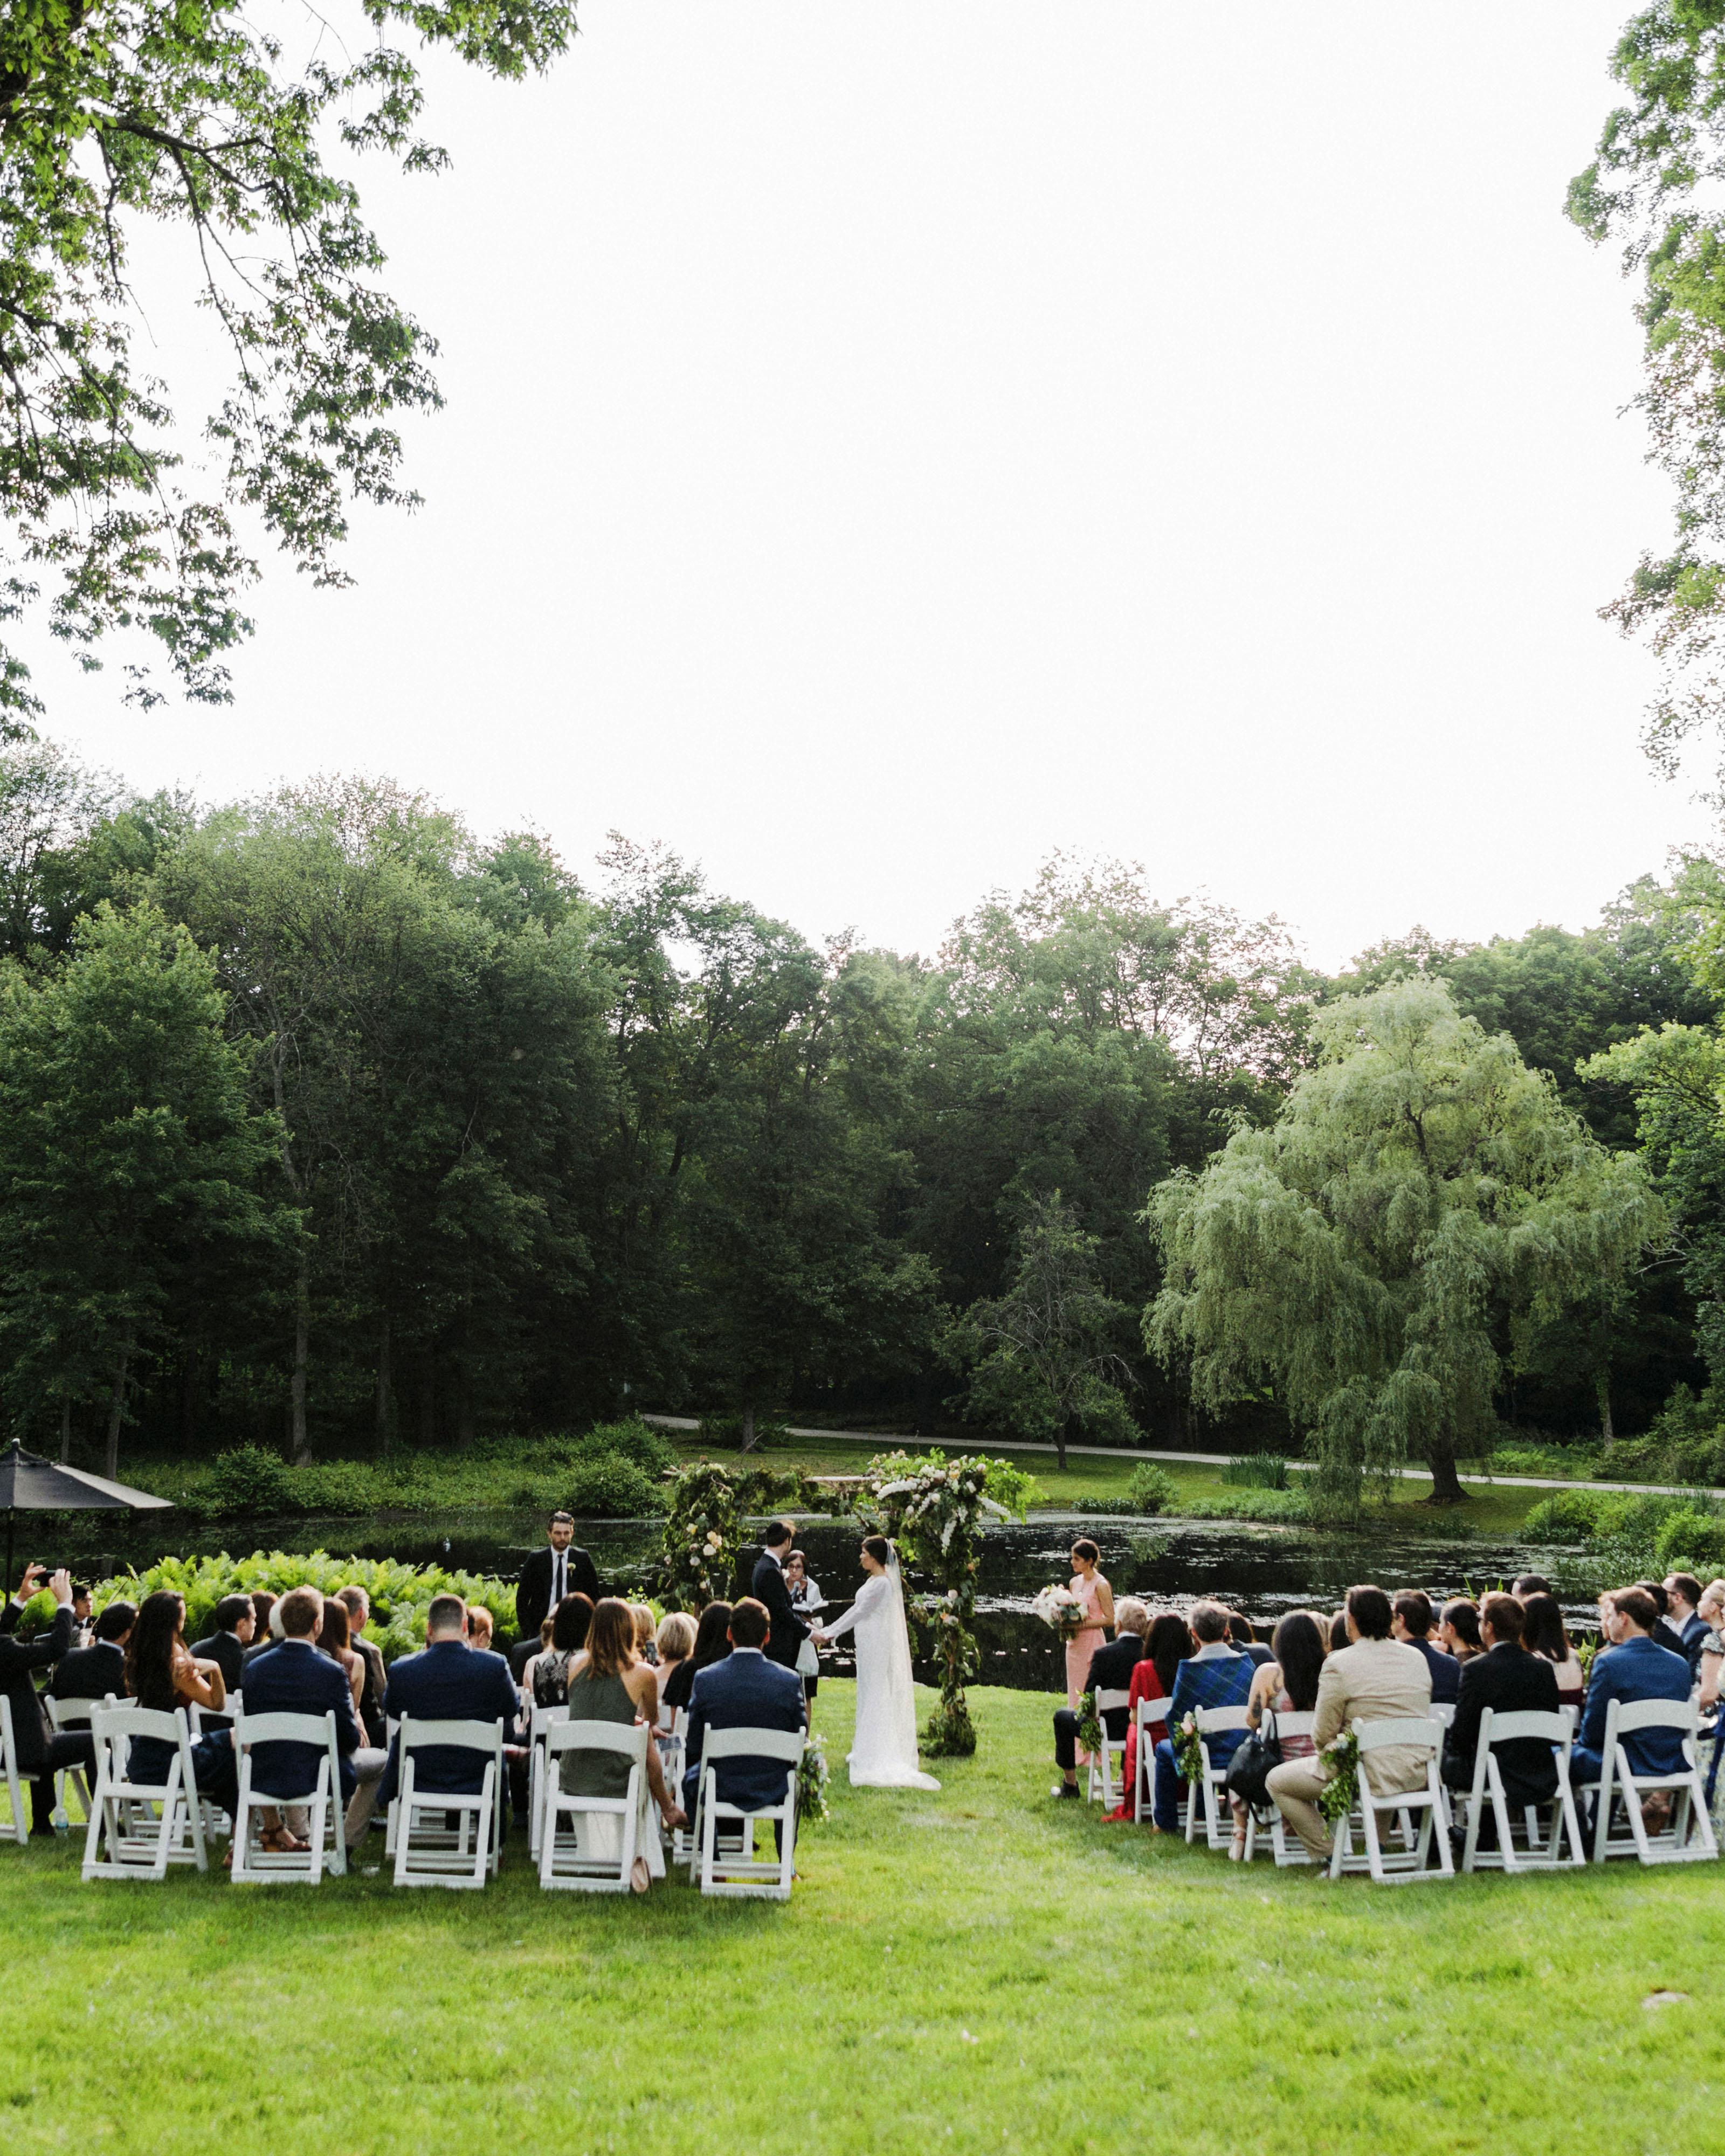 eden jack wedding ceremony